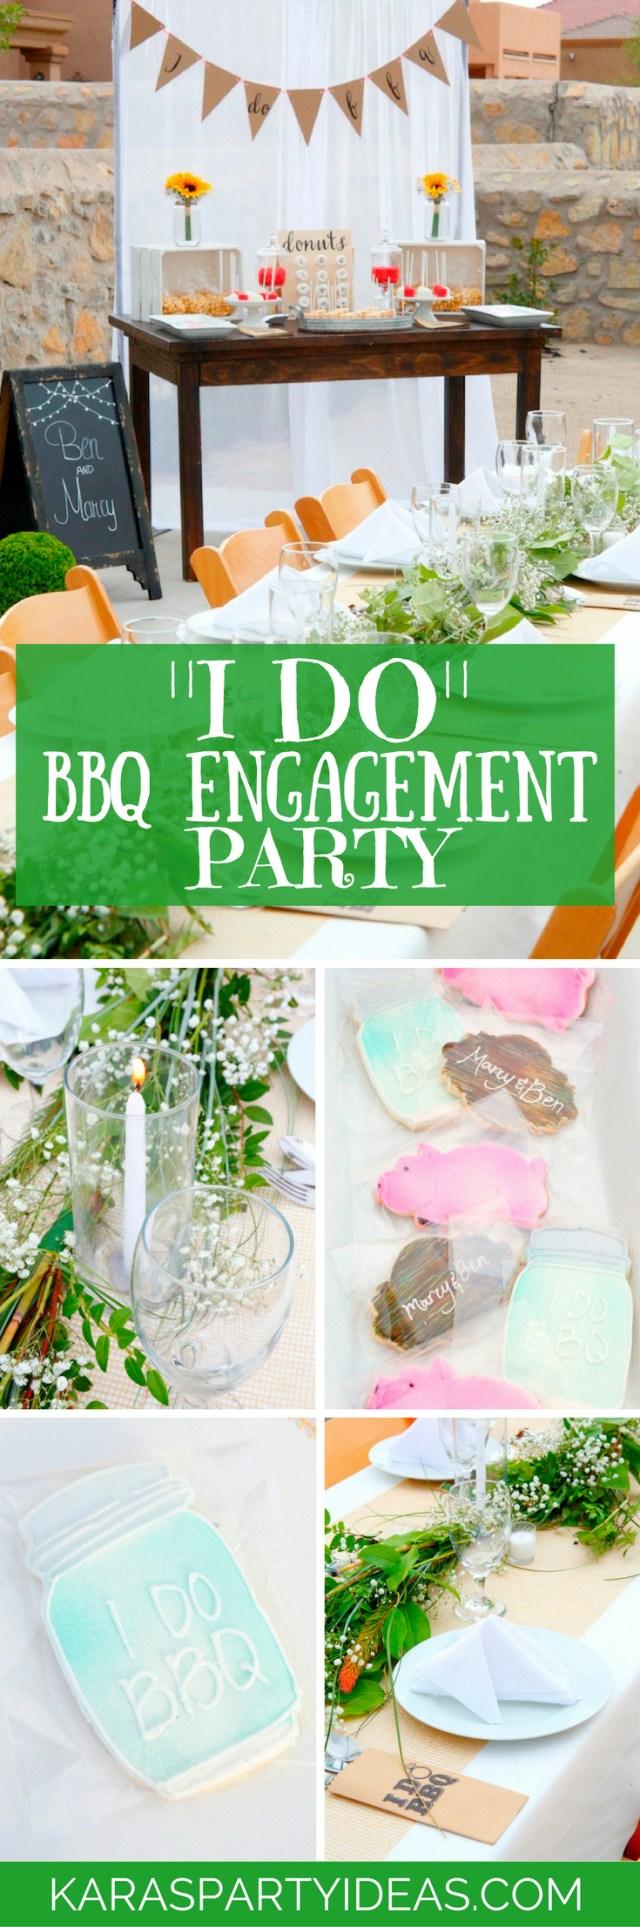 Rustic Engagement Party Ideas Karas Party Ideas I Do Bbq Engagement Party Karas Party Ideas